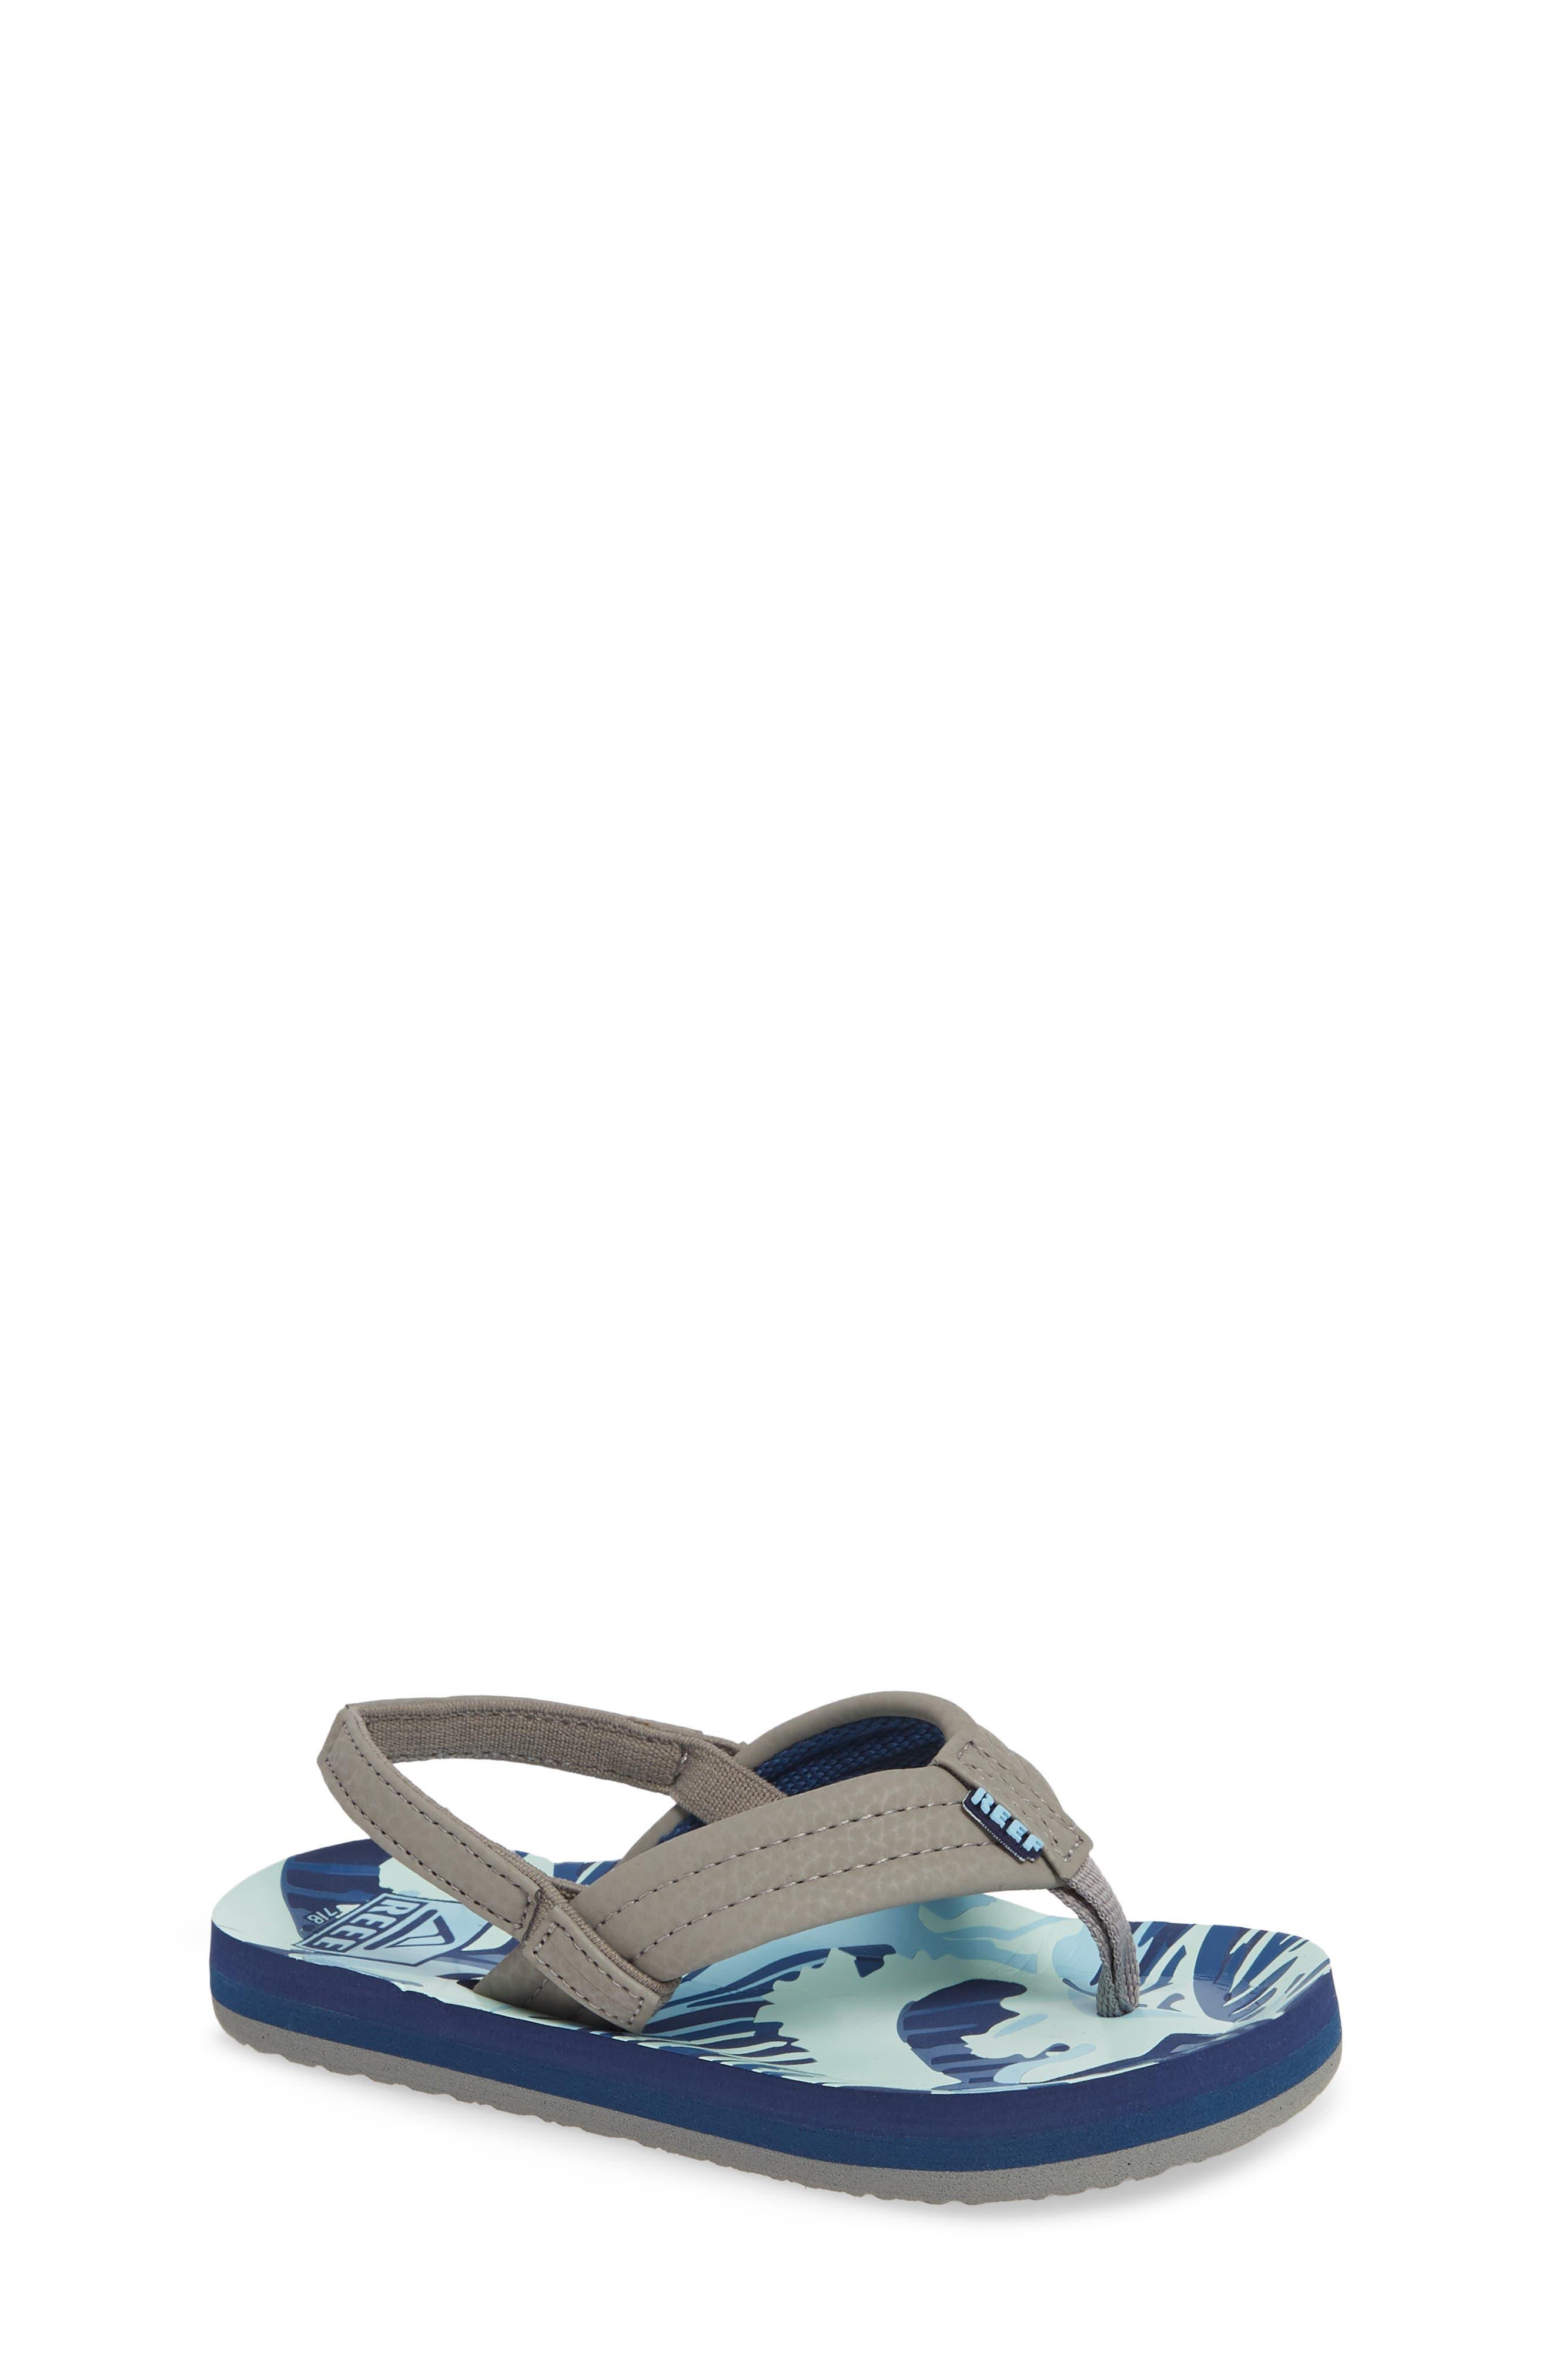 REEF 'Ahi' Sandal, Main, color, BLUE